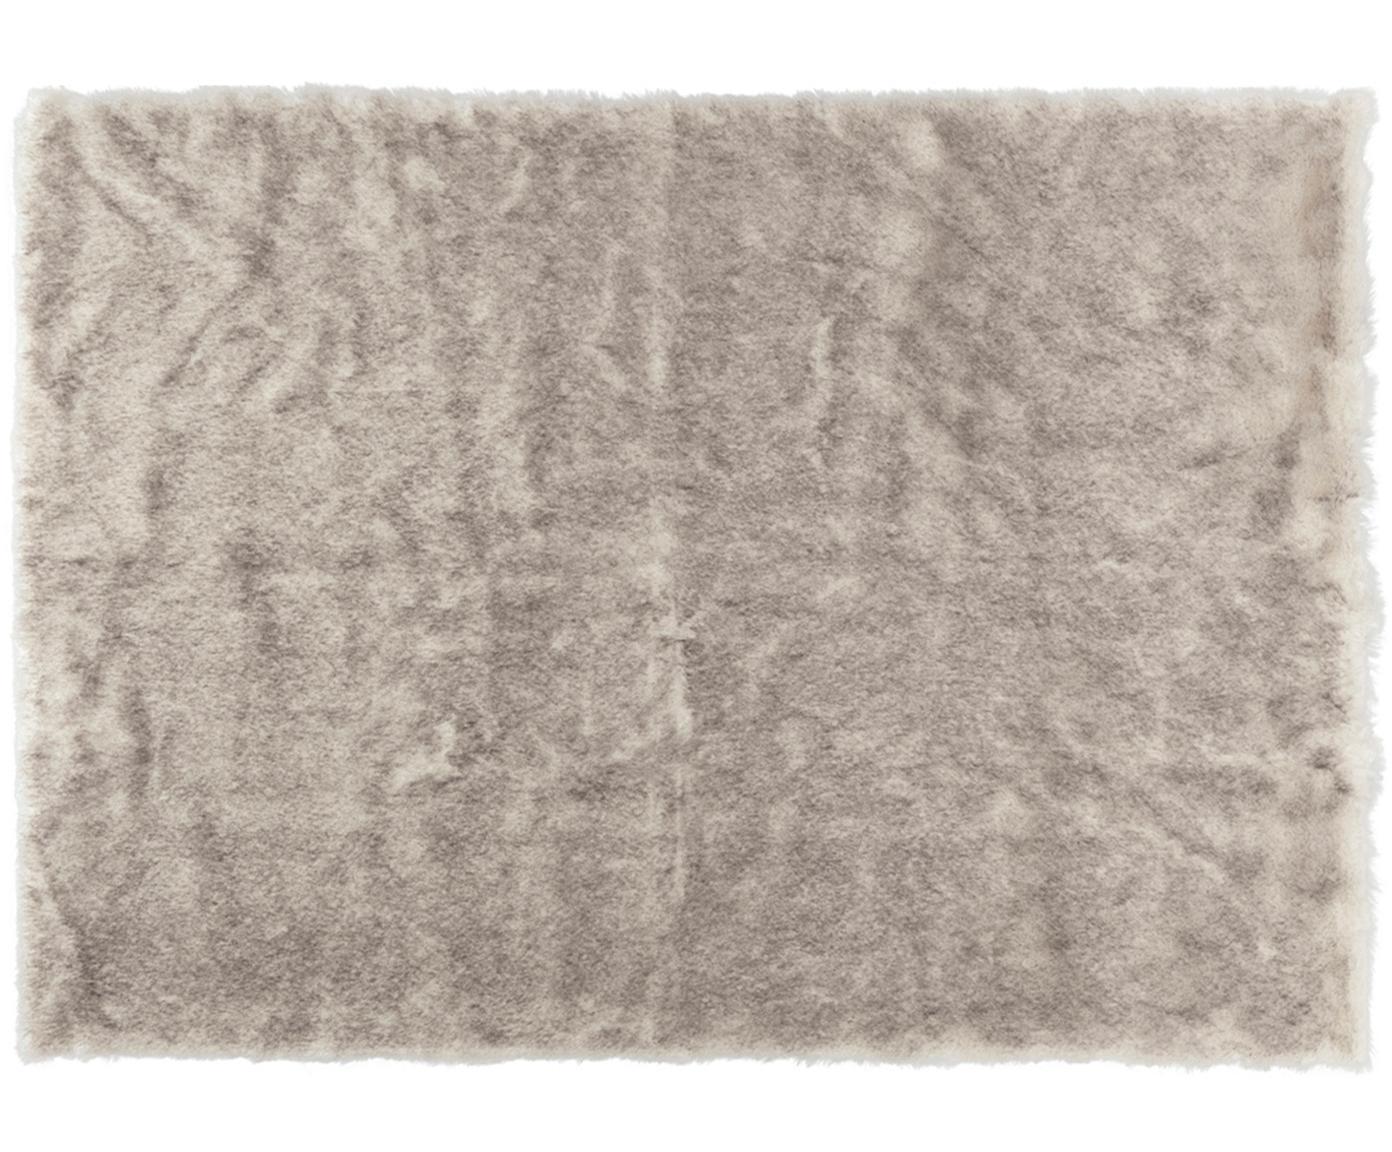 Alfombra de piel sintética Superior, Parte superior: 95% acrílico, 5% poliéste, Reverso: cuero sintético, Crema, beige, blanco, An 120 x L 170 cm (Tamaño S)